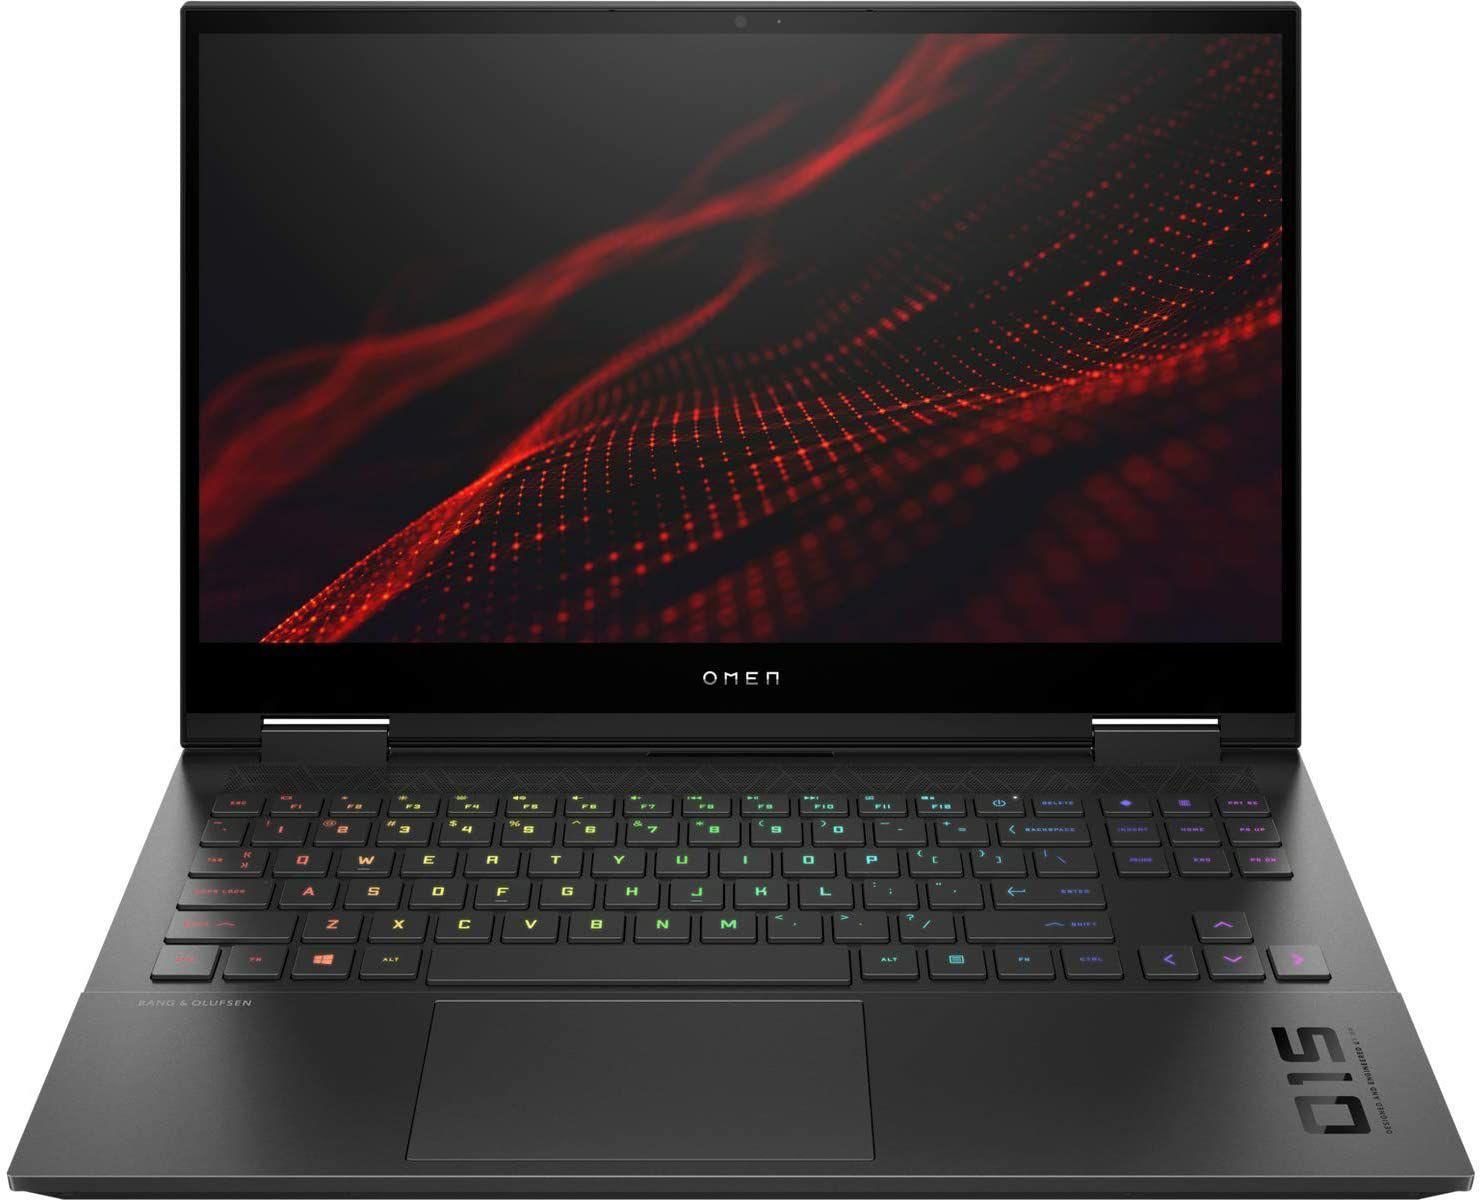 "Portátil HP OMEN 15.6"" FullHD IPS 300Hz (i7-10750H, 16GB RAM, 1TB SSD, RTX2070, sin sistema operativo)"